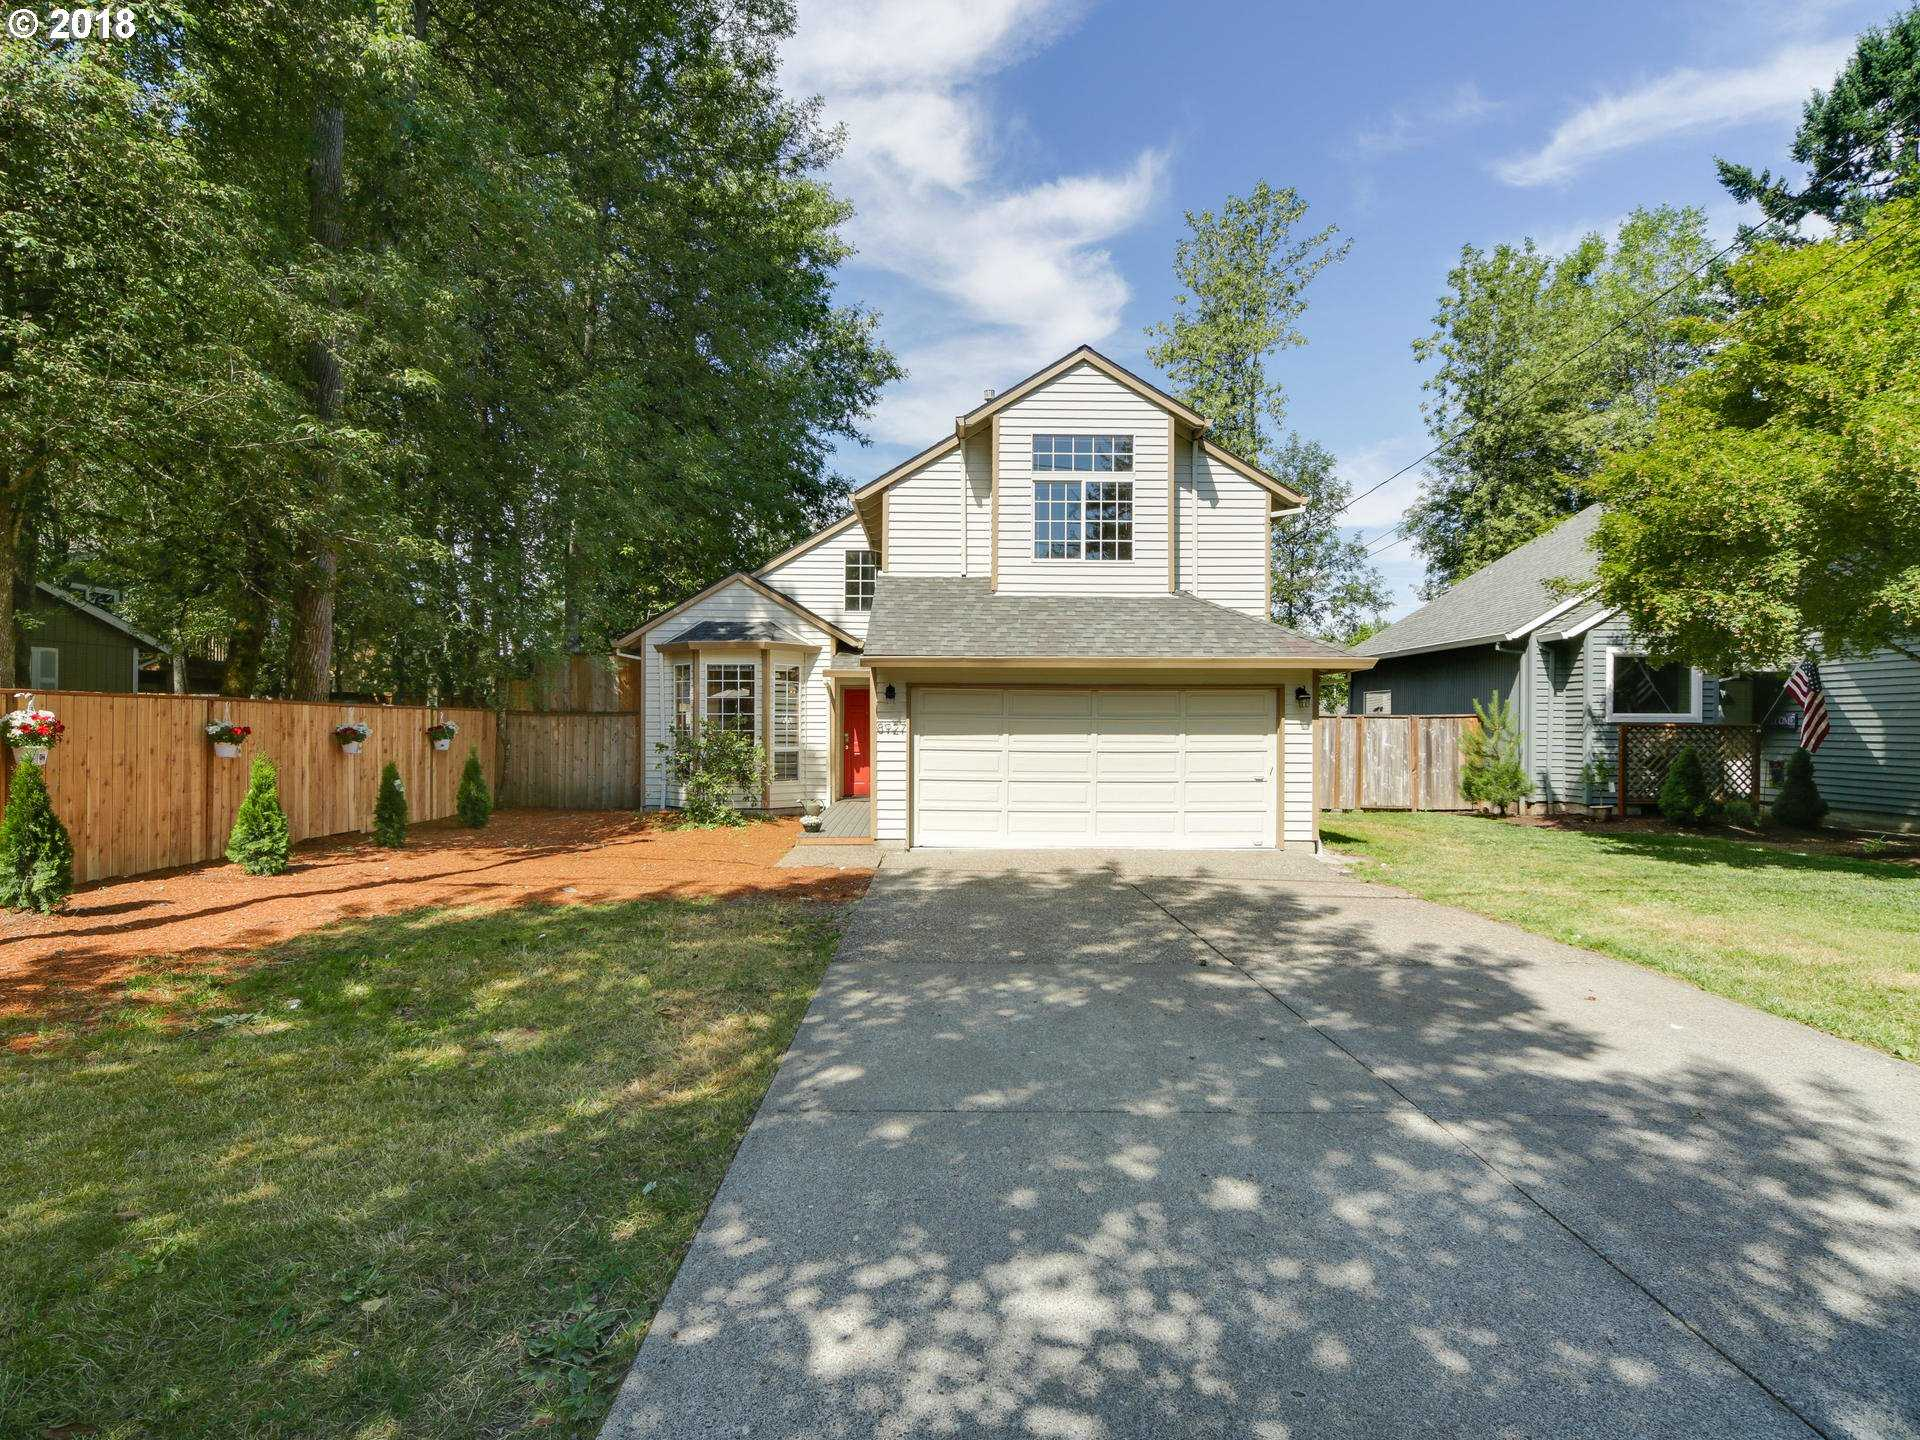 $479,900 - 3Br/3Ba -  for Sale in Ashcreek/multnomah Village, Portland